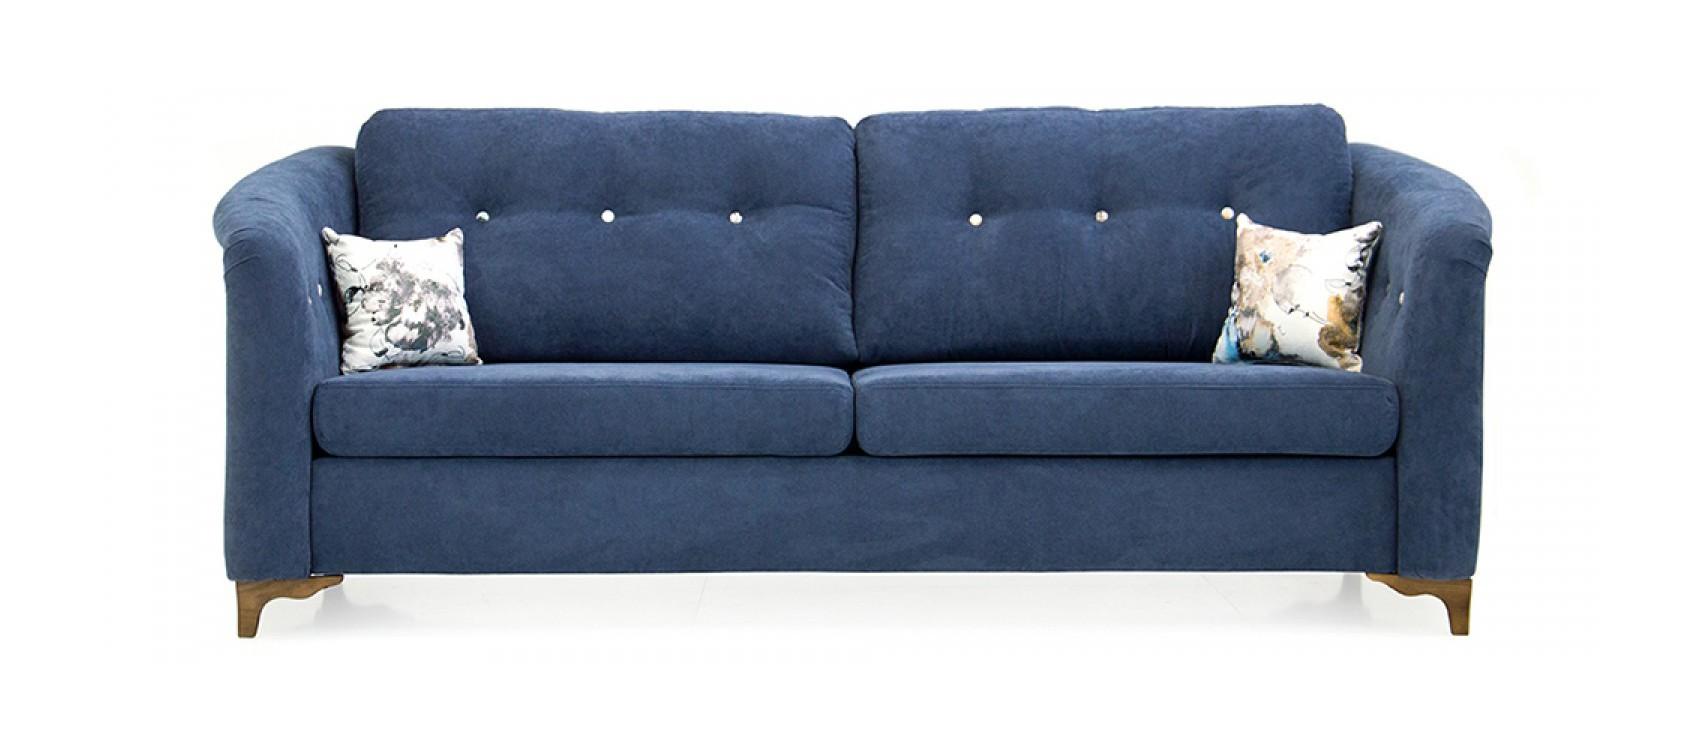 Sofa MAXBURG фото 1